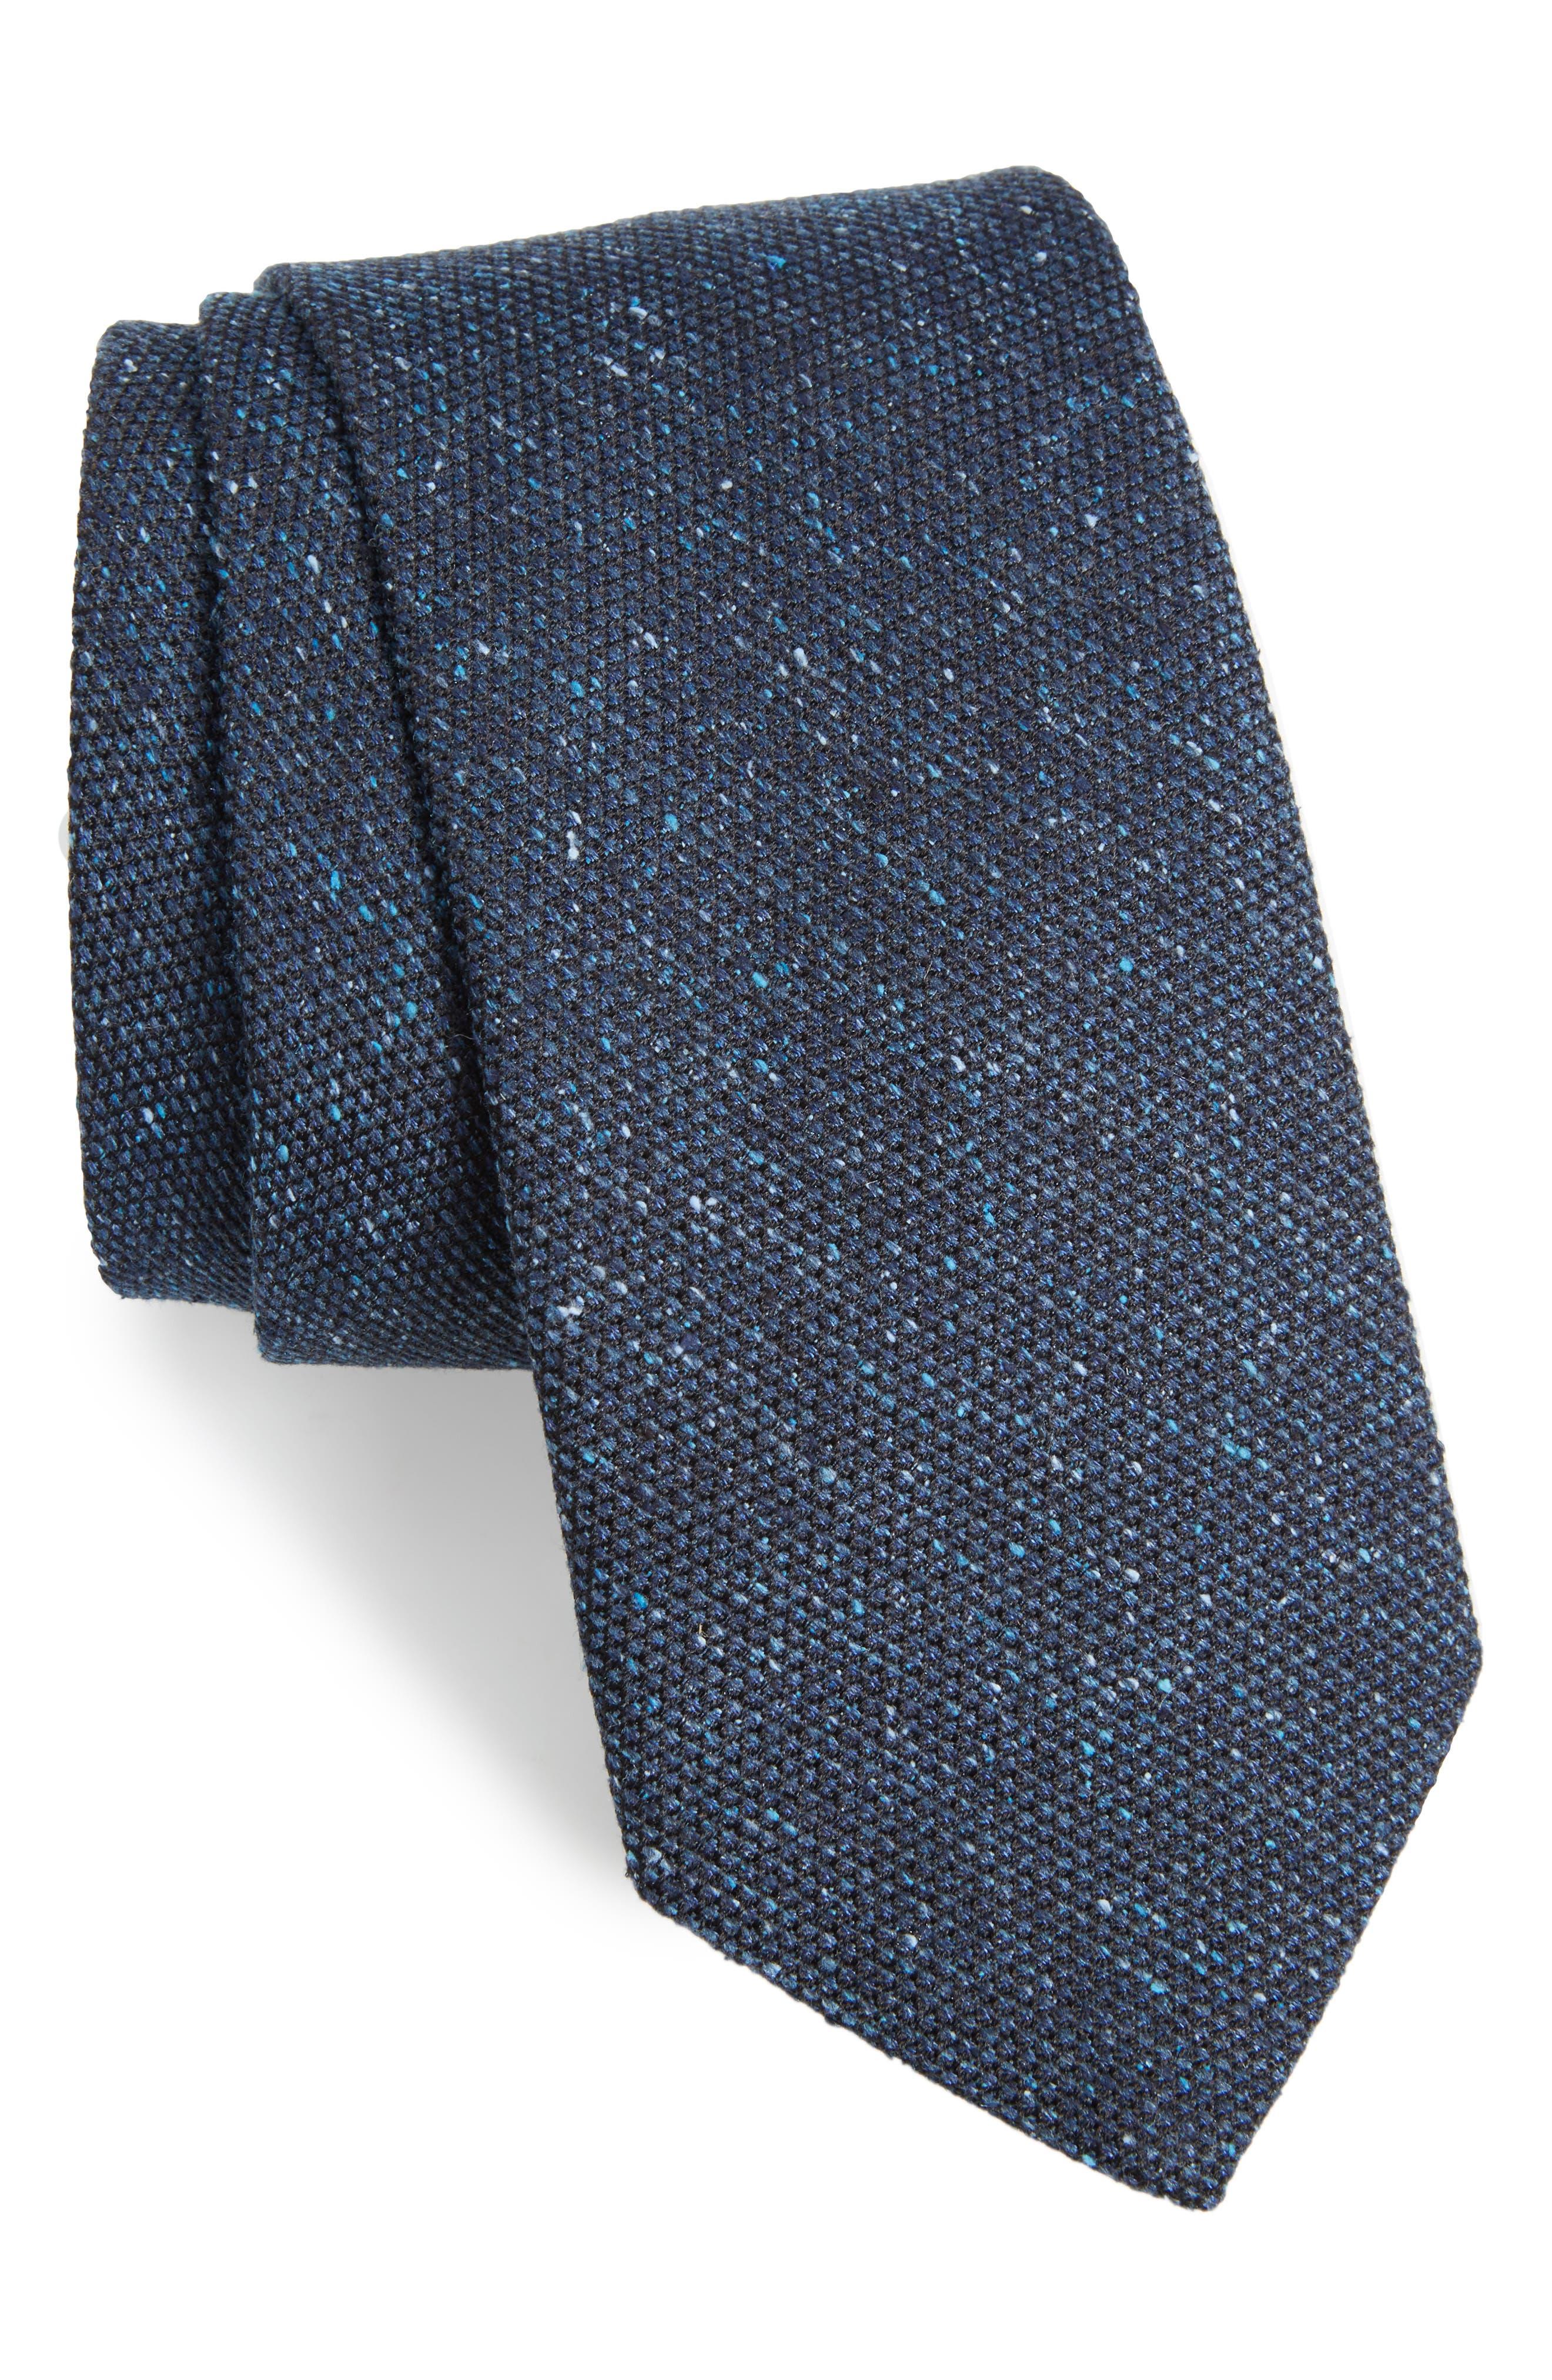 Main Image - Bonobos Solid Silk Tweed Tie